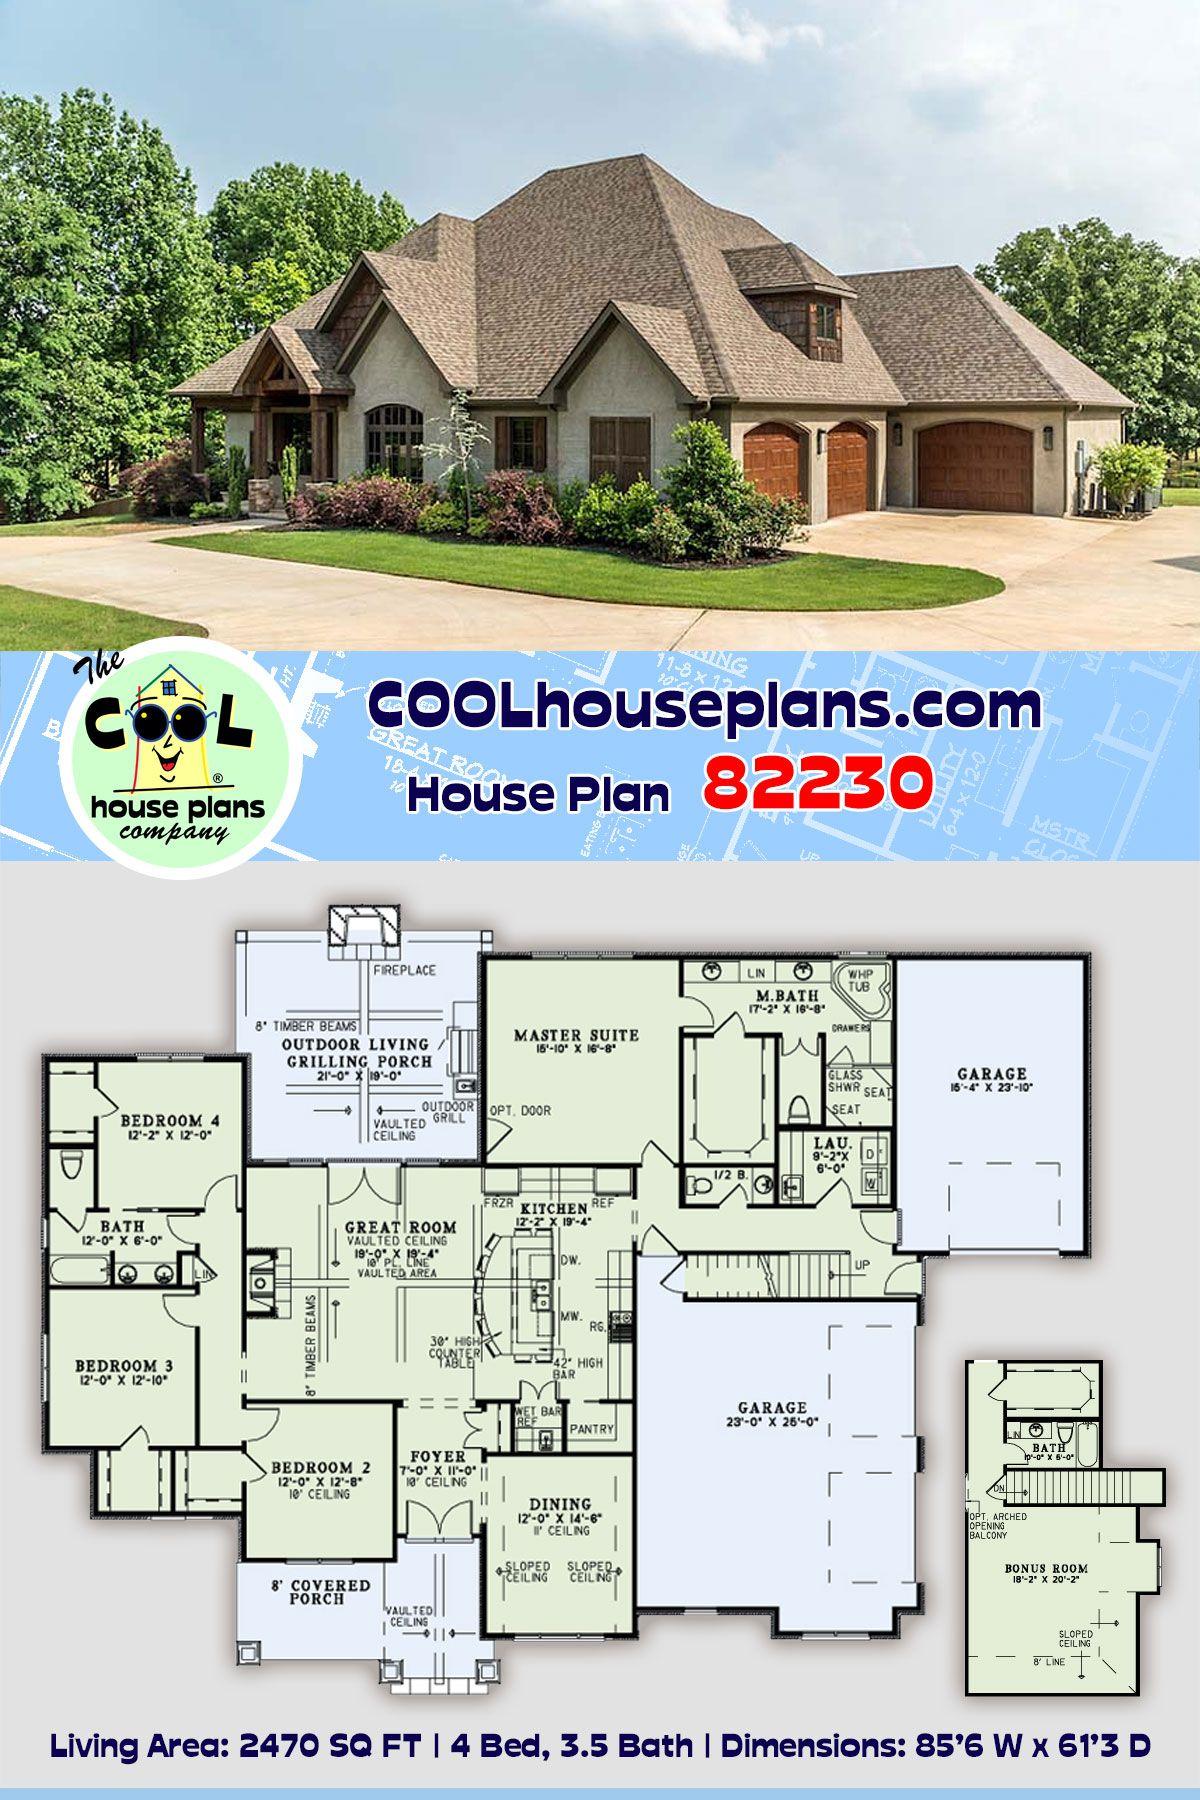 European Style House Plan 82230 With 4 Bed 4 Bath 3 Car Garage In 2020 Best House Plans Ranch House Plans House Plans